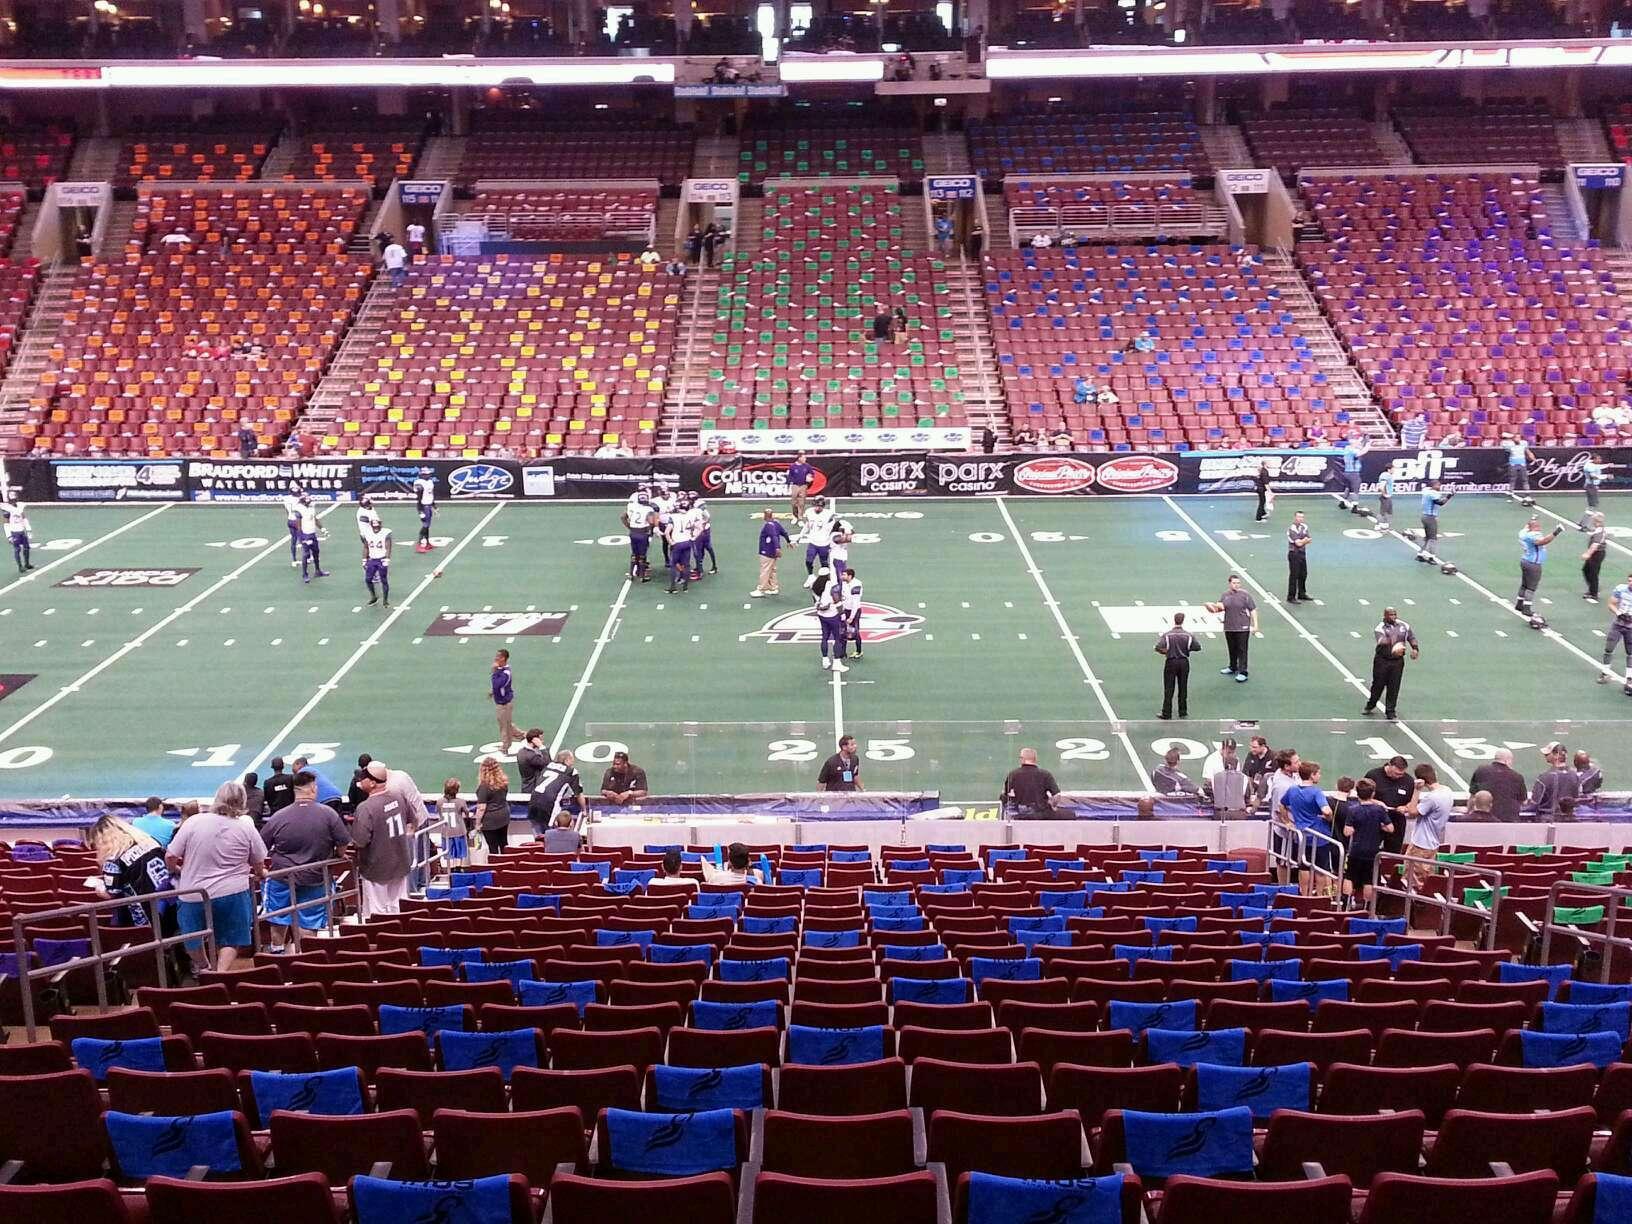 Wells Fargo Center Section SB1 Row 1 Seat 7